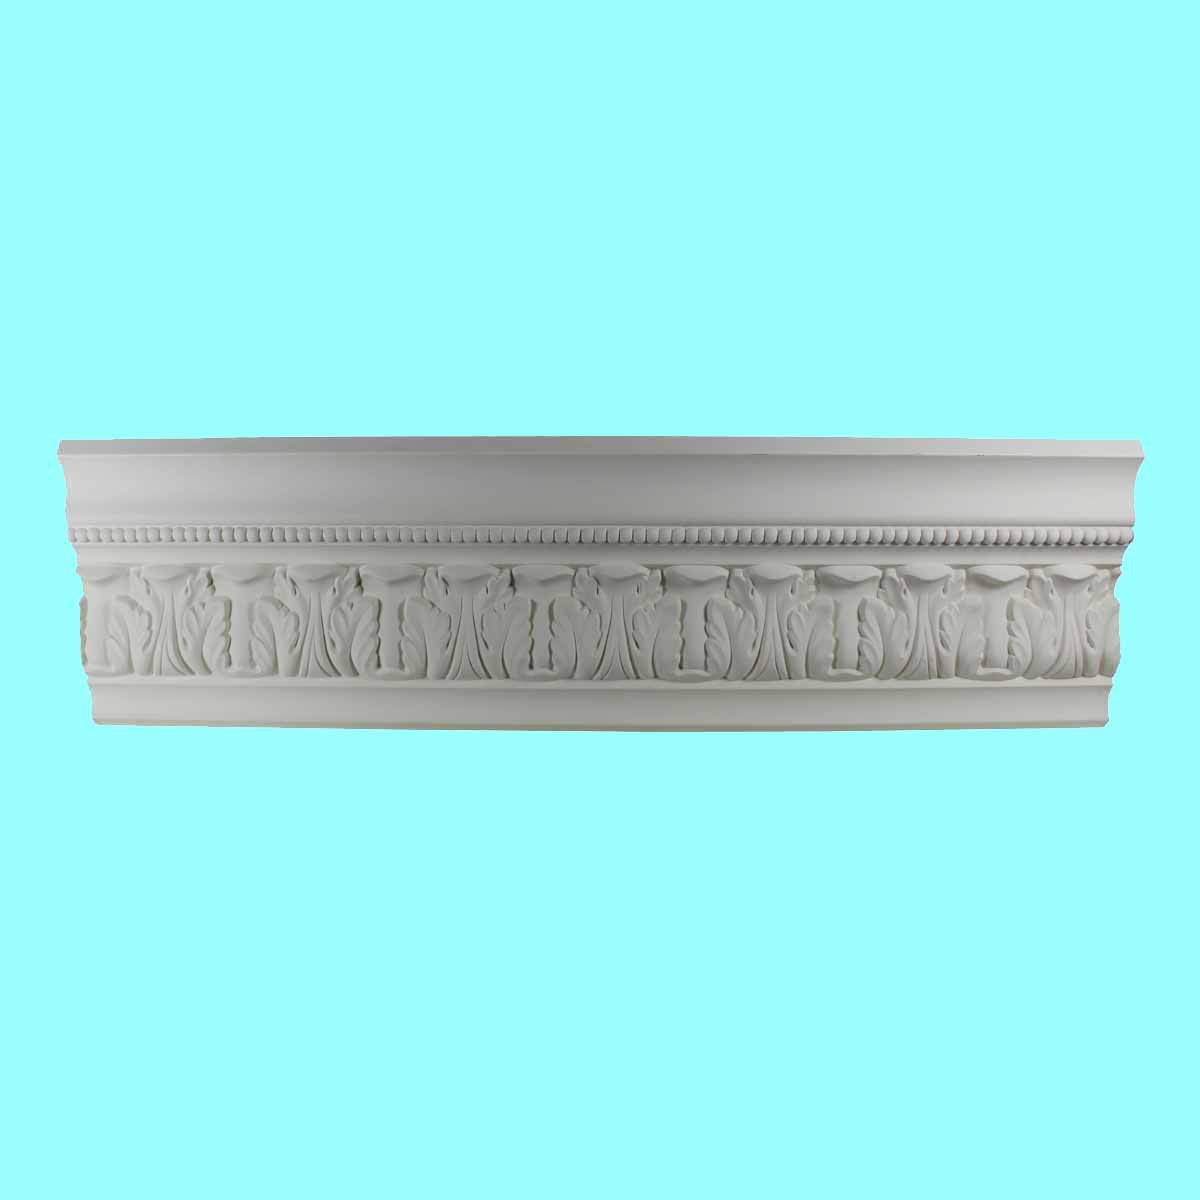 Cornice White Urethane Sample of 11578 24 Long Cornice Cornice Moulding Cornice Molding